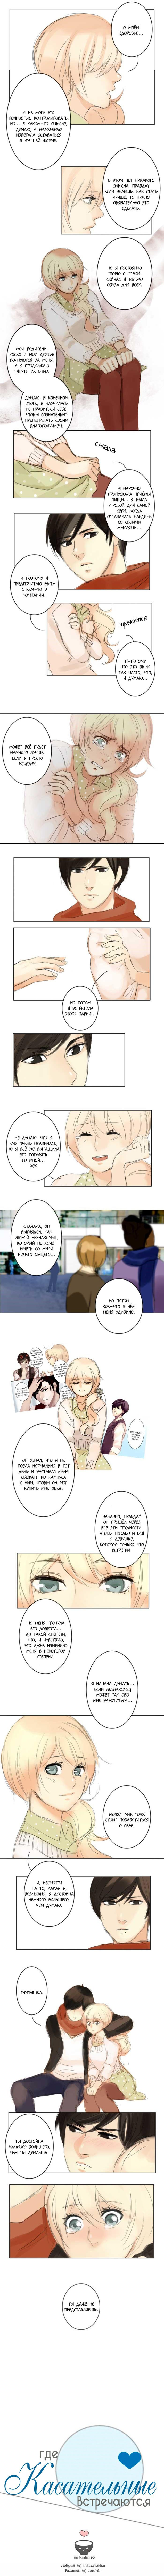 https://r1.ninemanga.com/comics/pic2/21/22485/276778/1445570730897.jpg Page 4